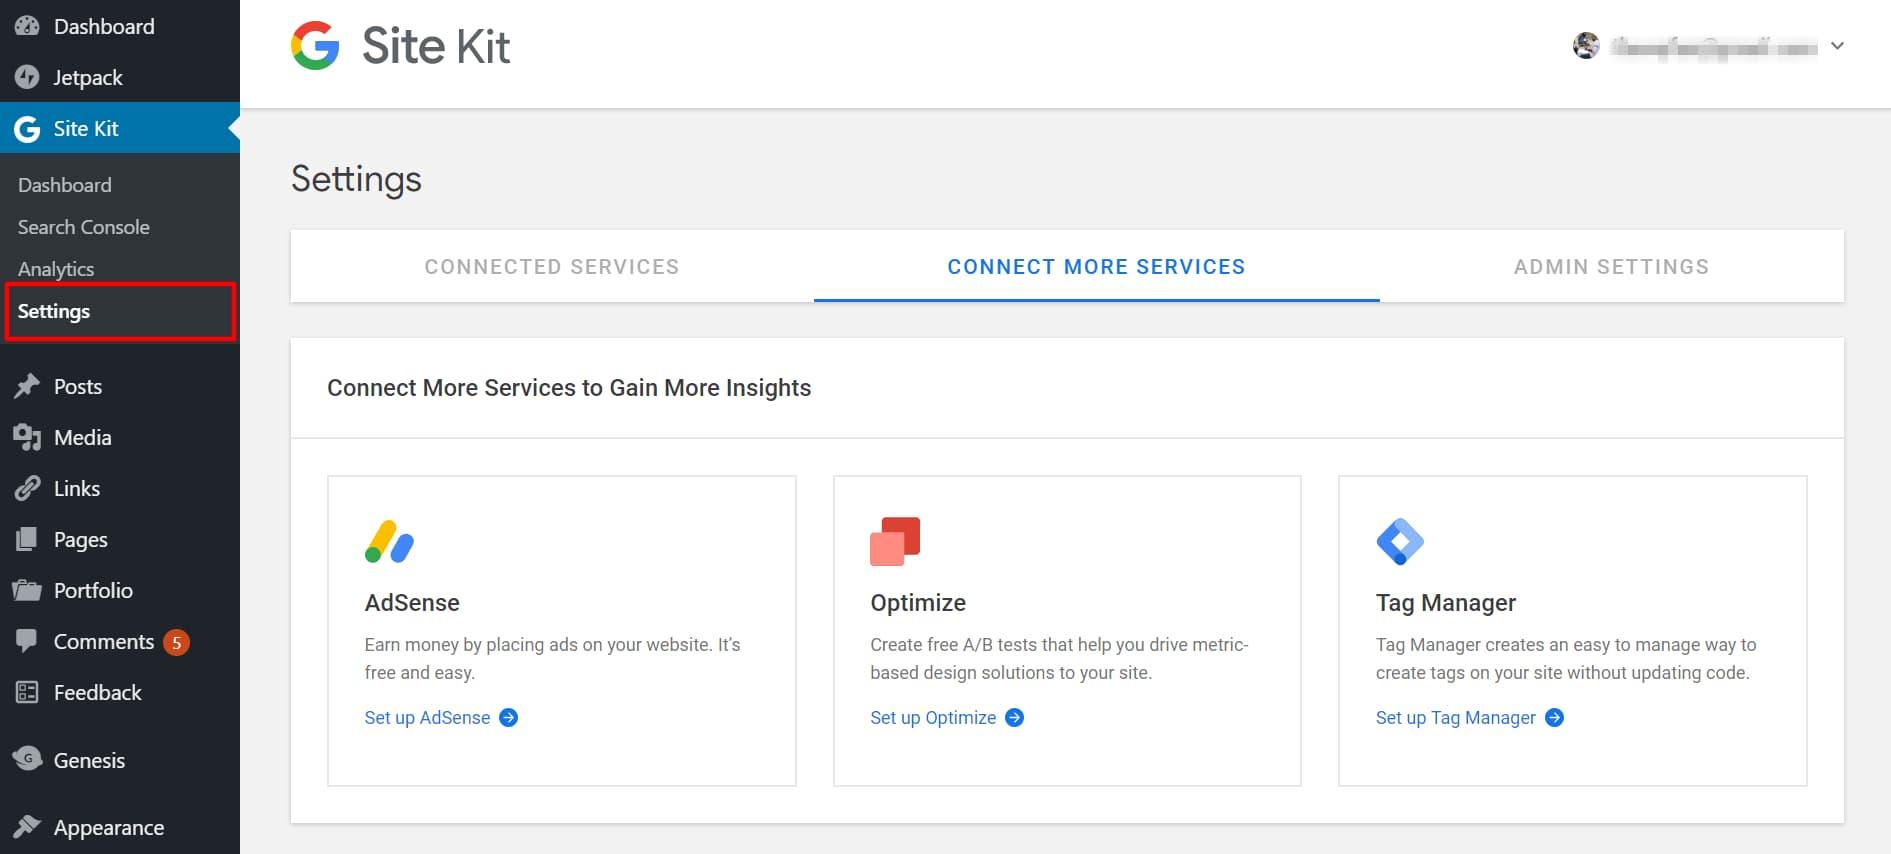 google site kit settings page